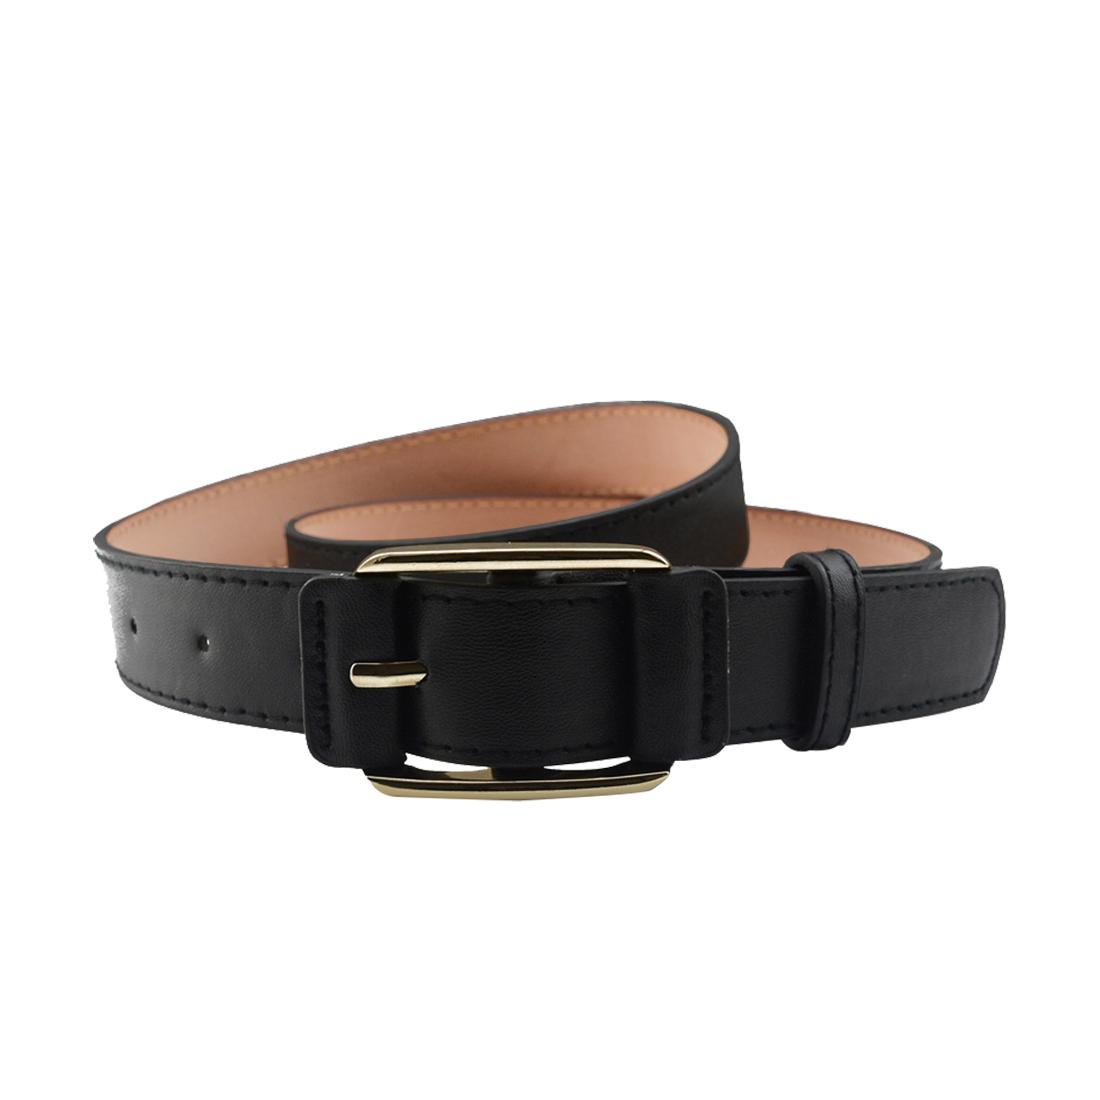 "Women Double Stitched Imitation Leather Pin Buckle Adjustable Belt 1 1/8"" Black"